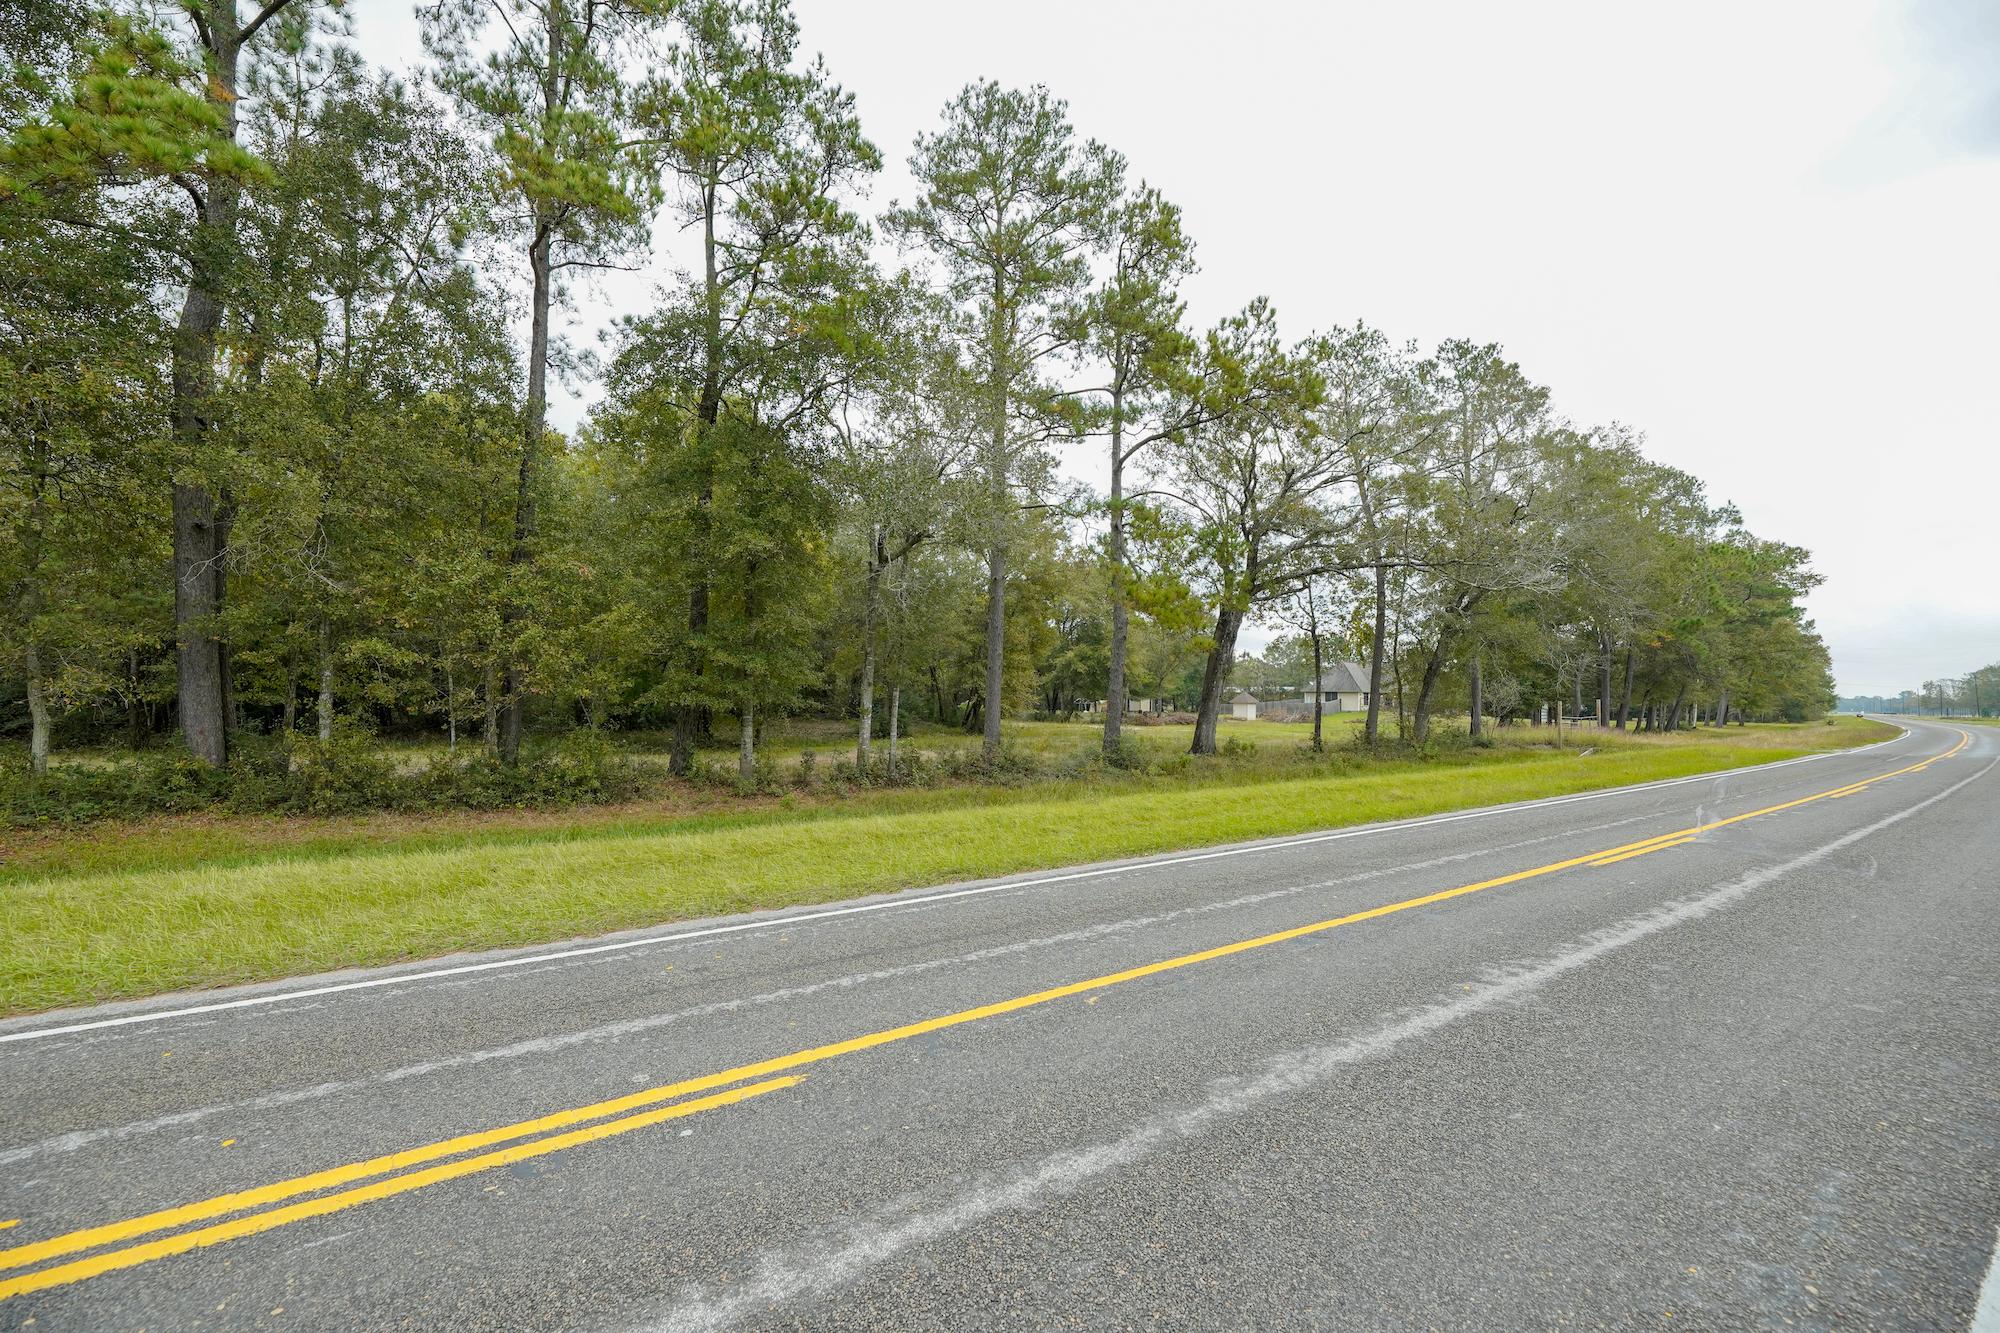 Jefferson County Development Land - Image 29 of 36